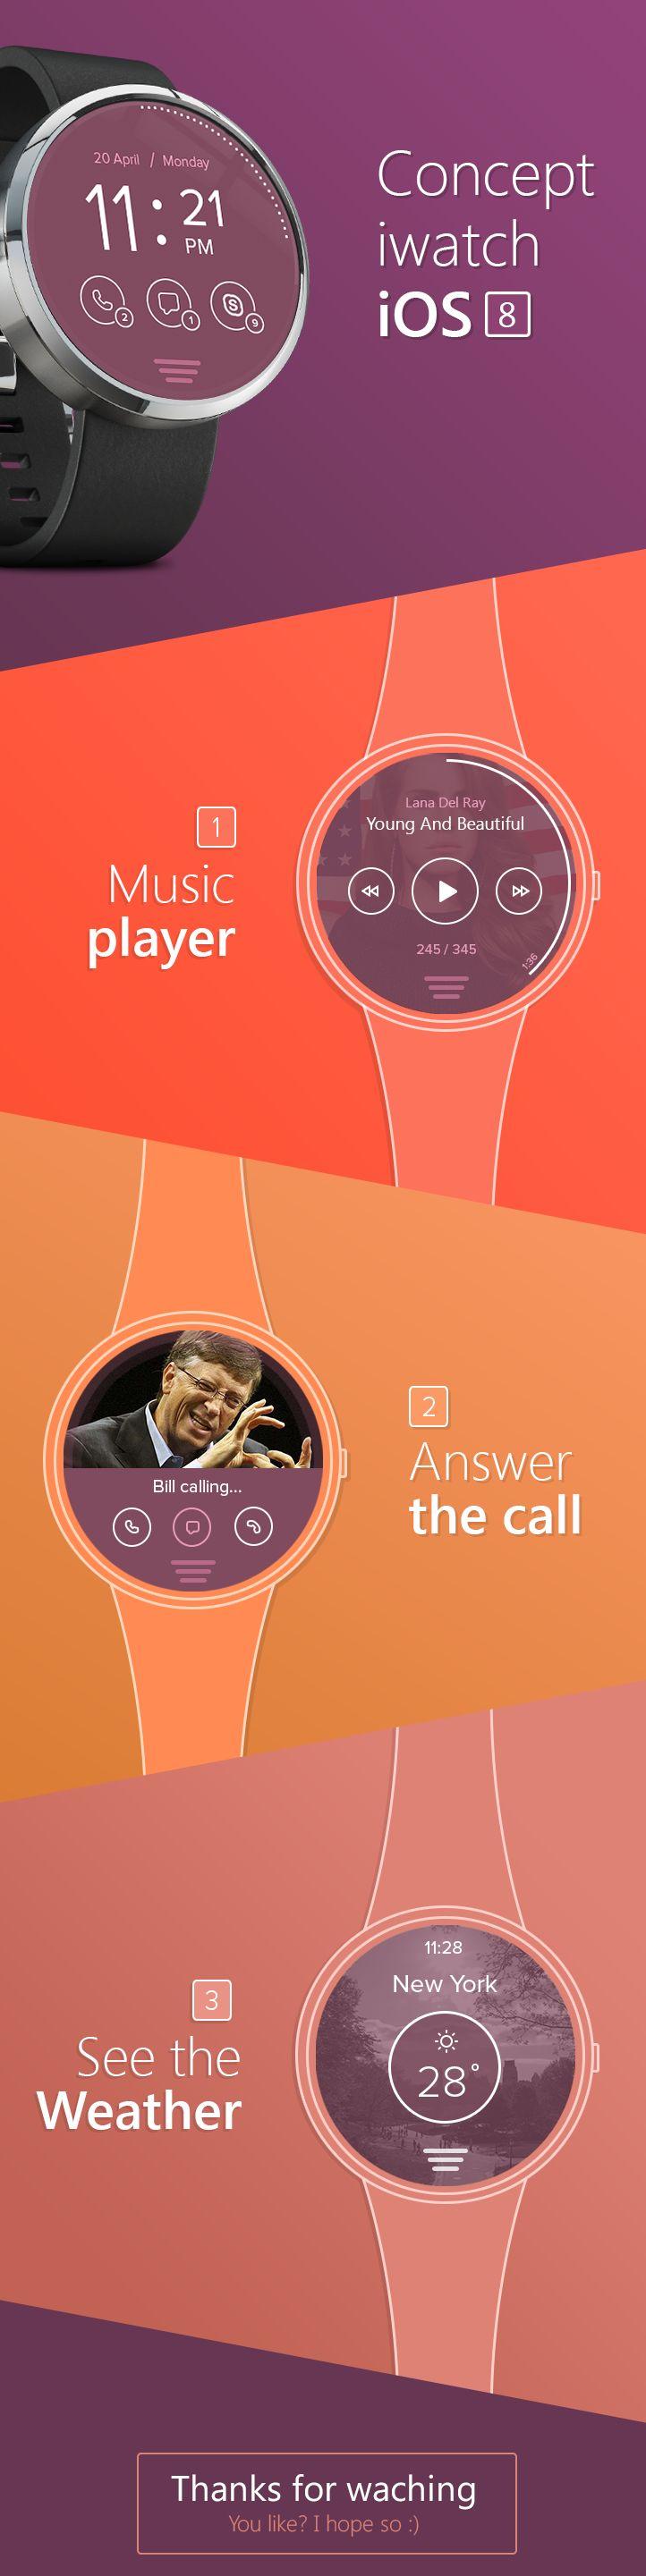 Concept iOS8 in iWatch #ios8 #iwatchcencept #ios8design